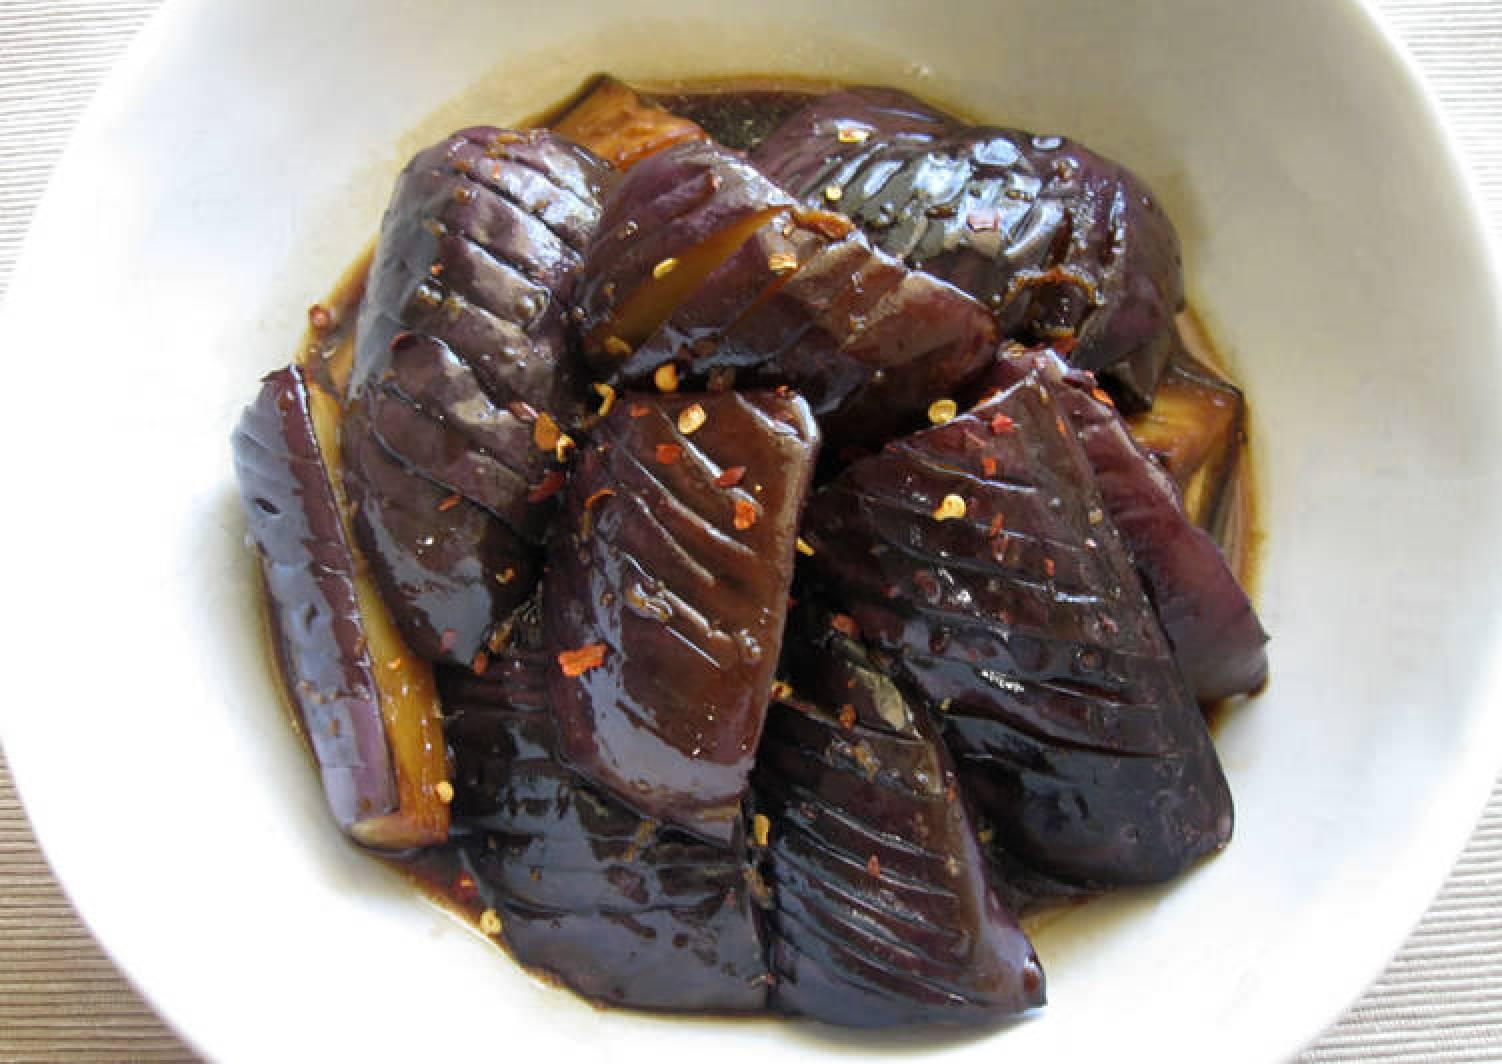 Ponzu Marinated Eggplants